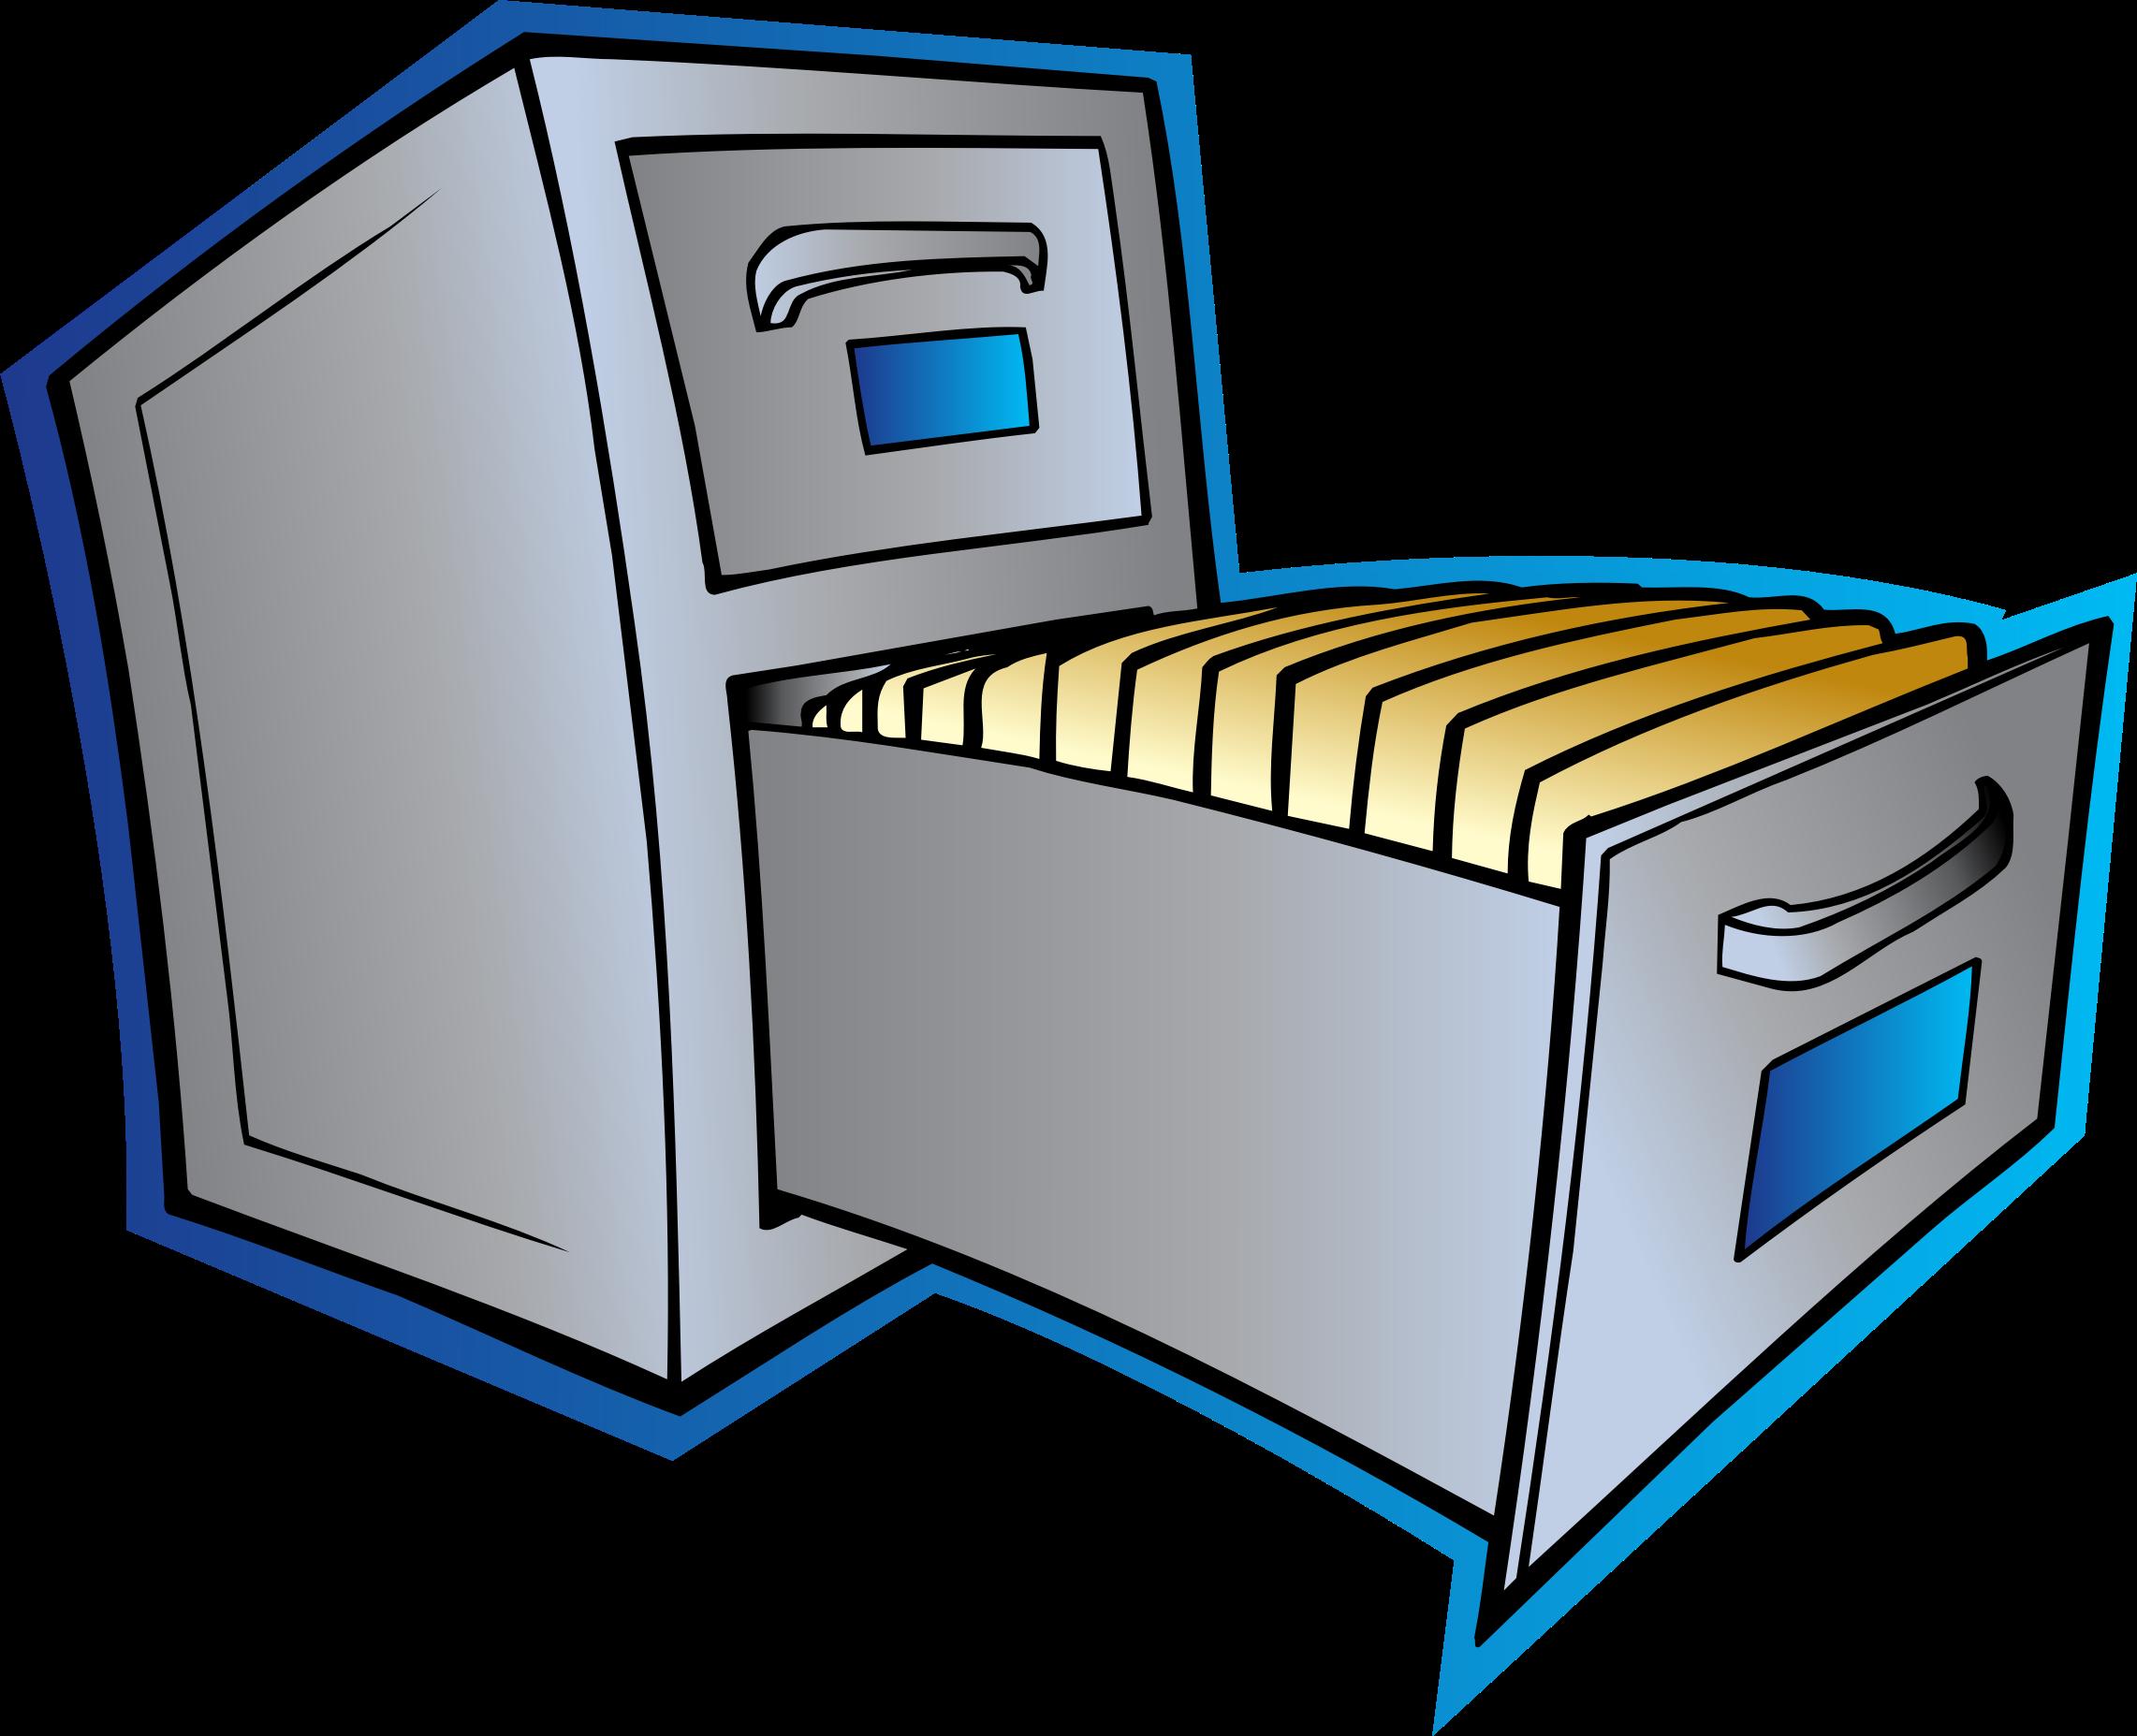 small file cabinet clipart clipart kid